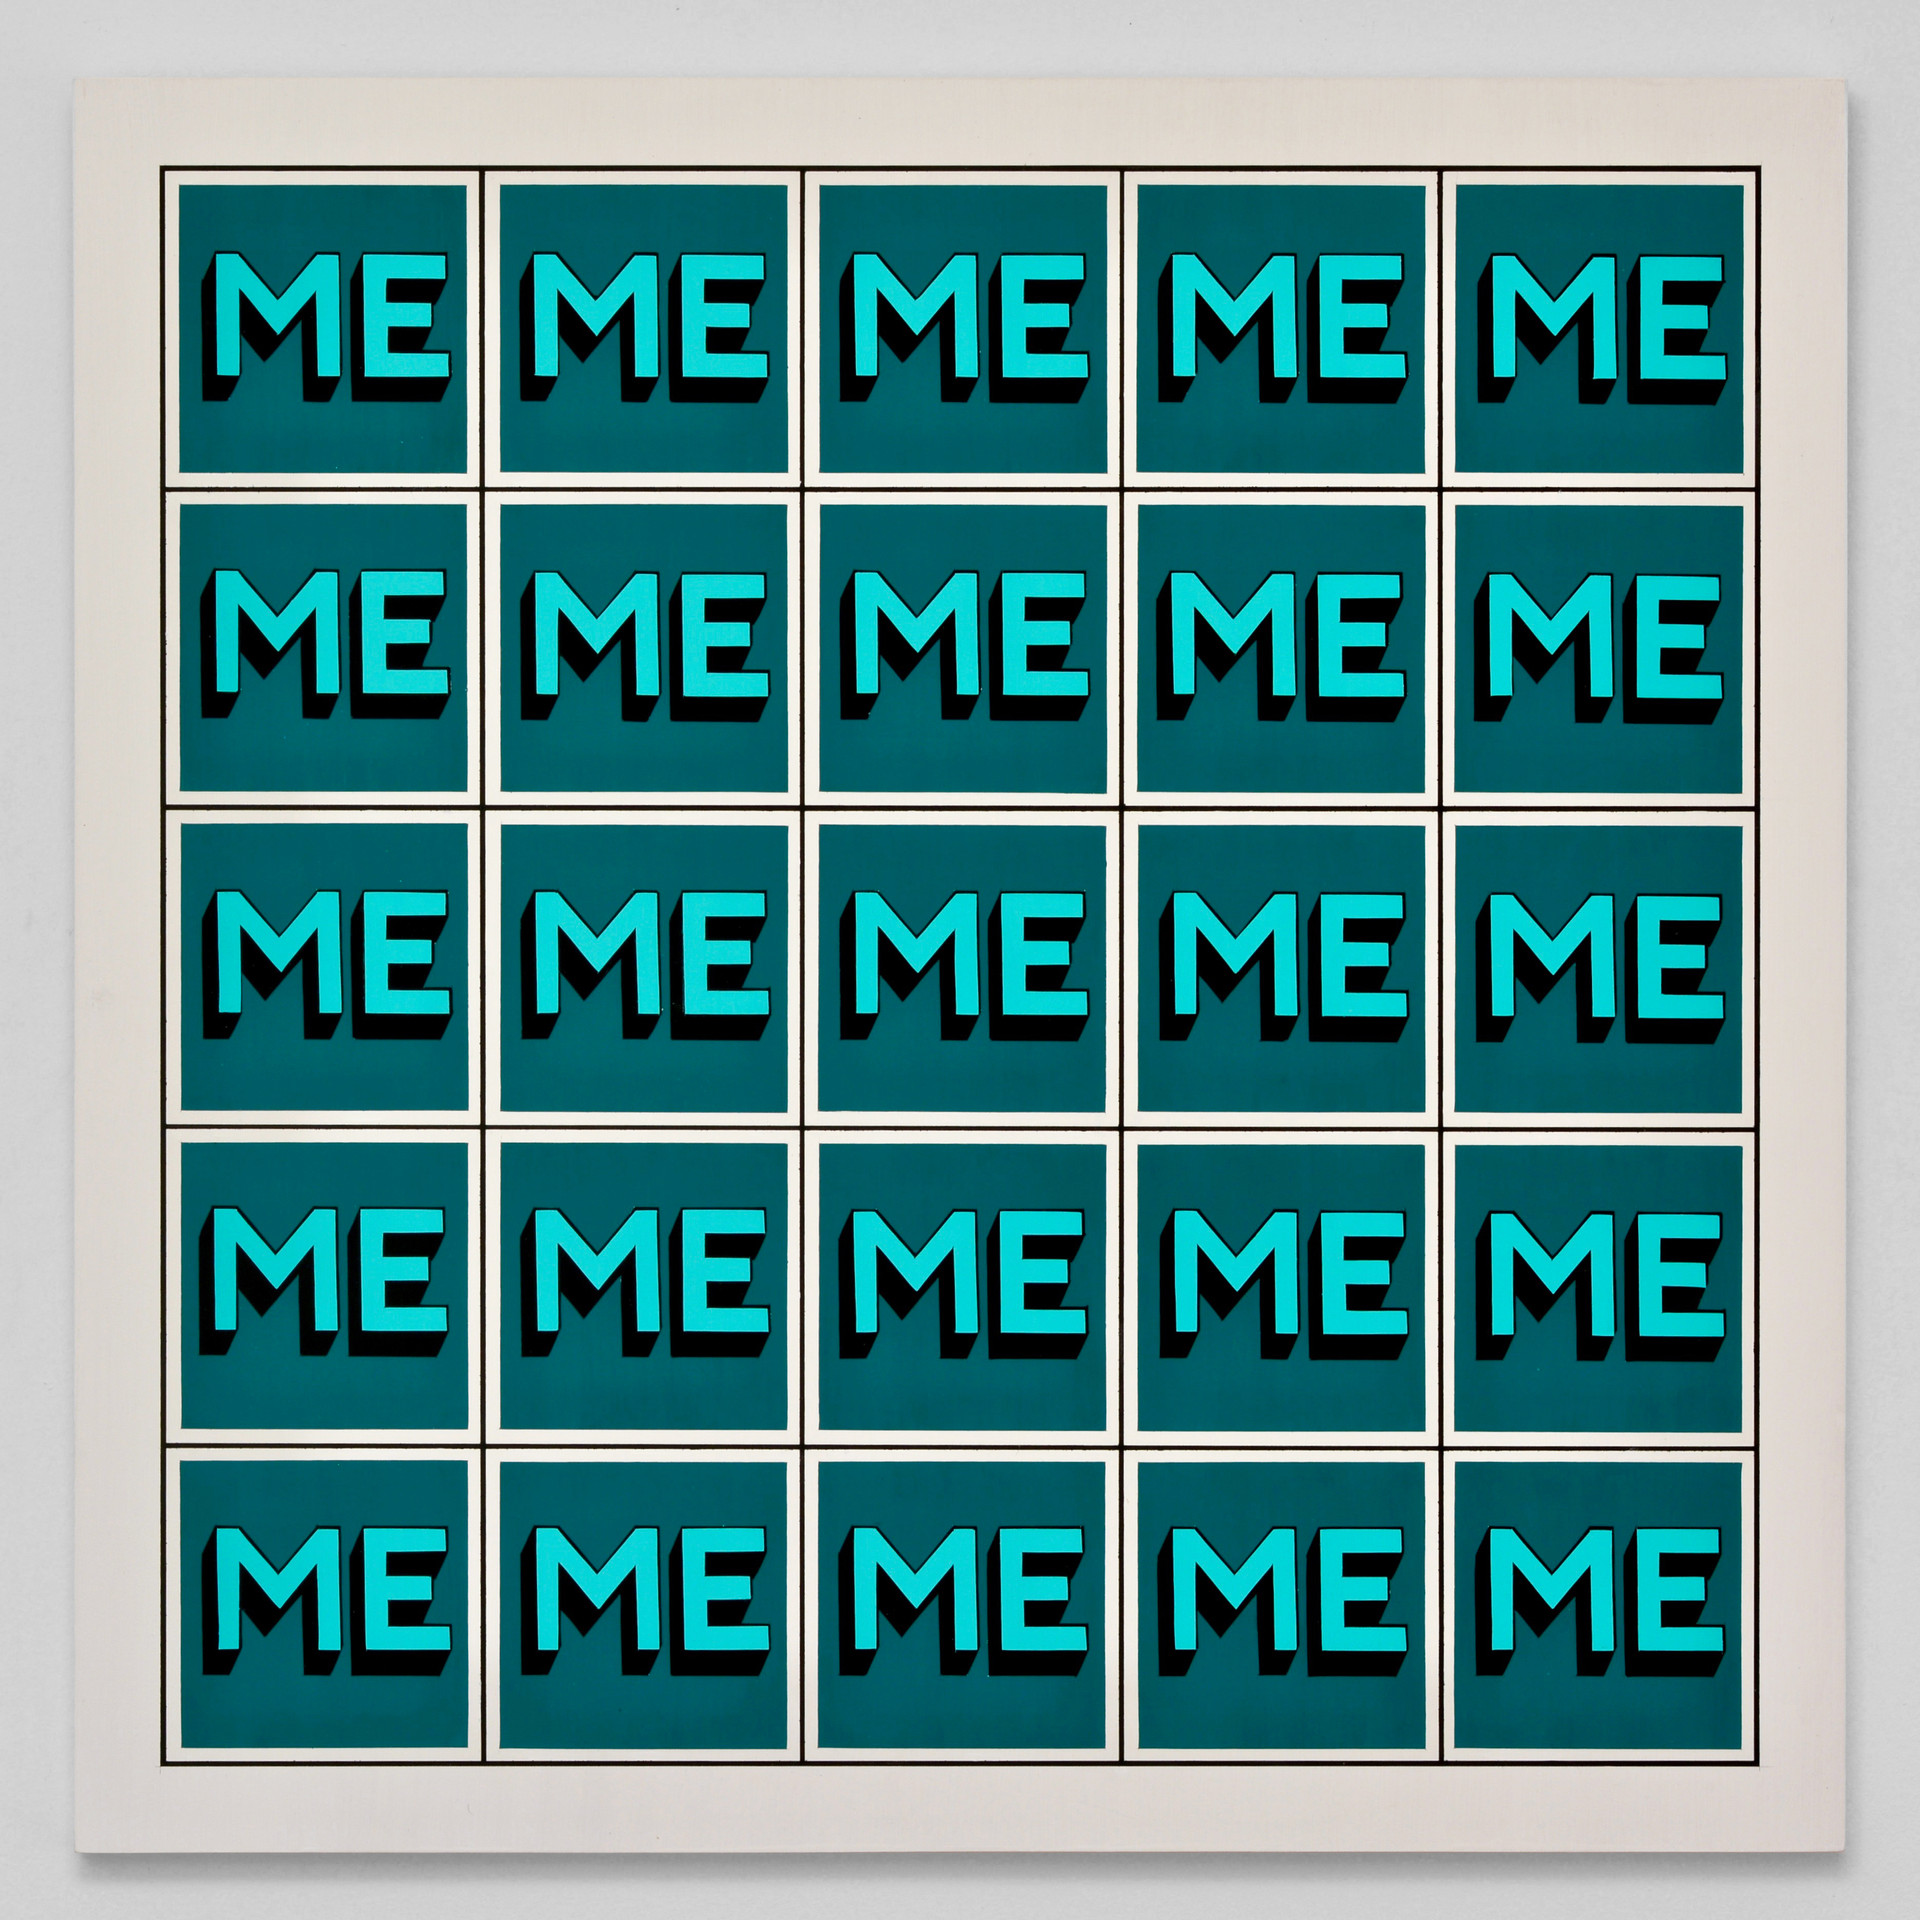 ME_030.jpg